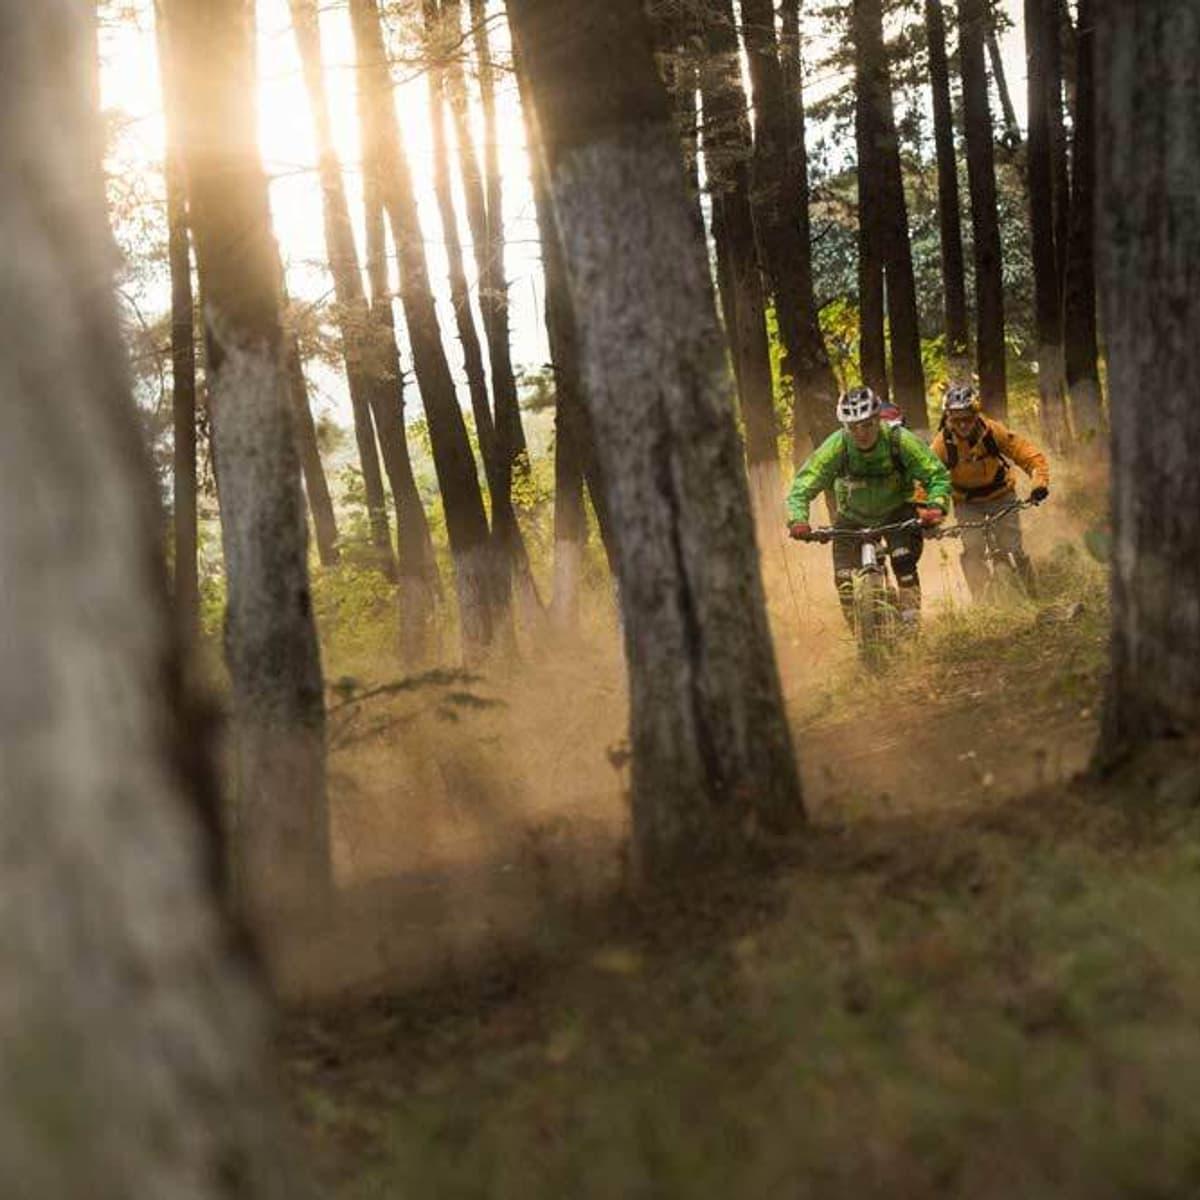 Golden Arches Hans Rey forest mountain biking on custom Guatemala bike tour